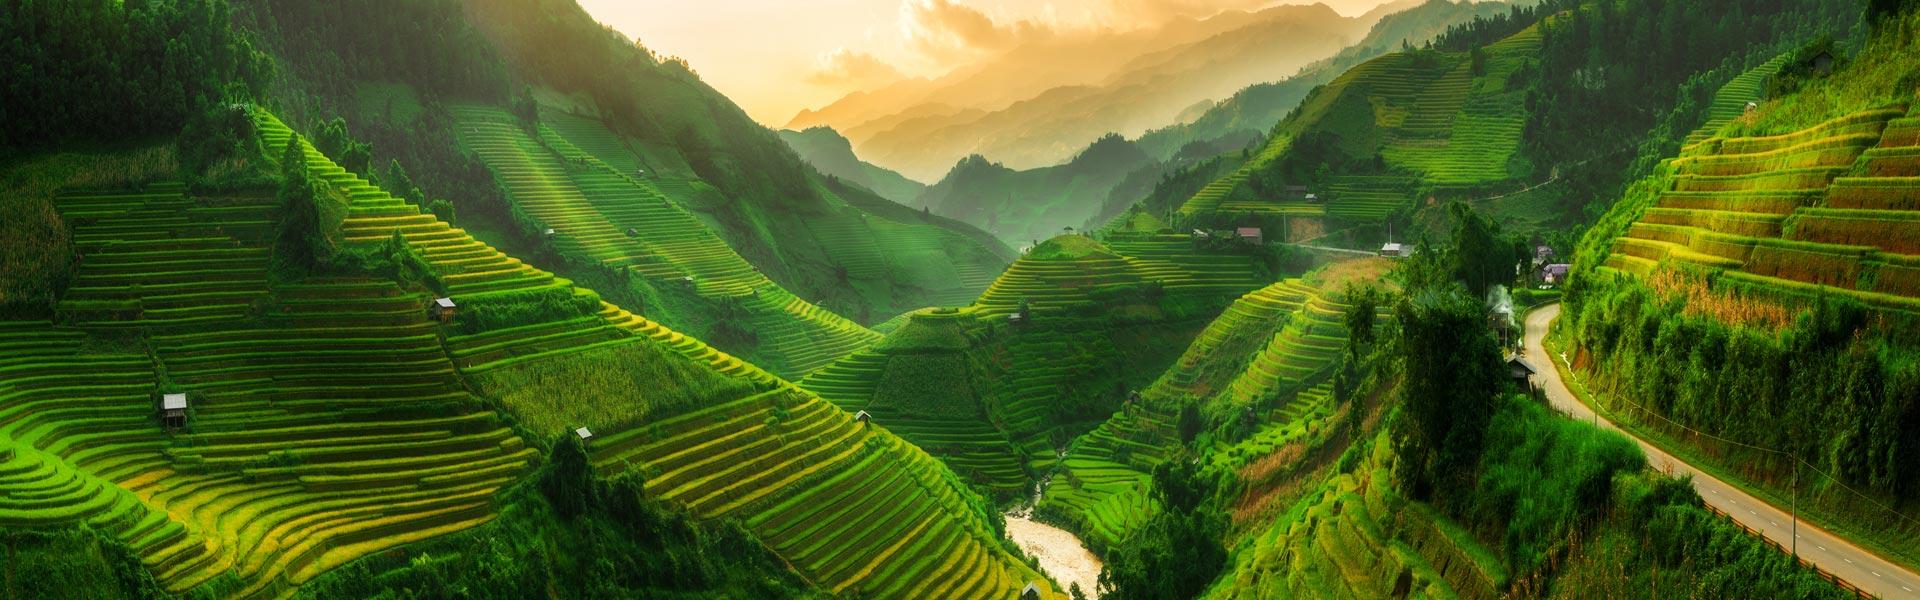 Rice Terraces Southeast Asia